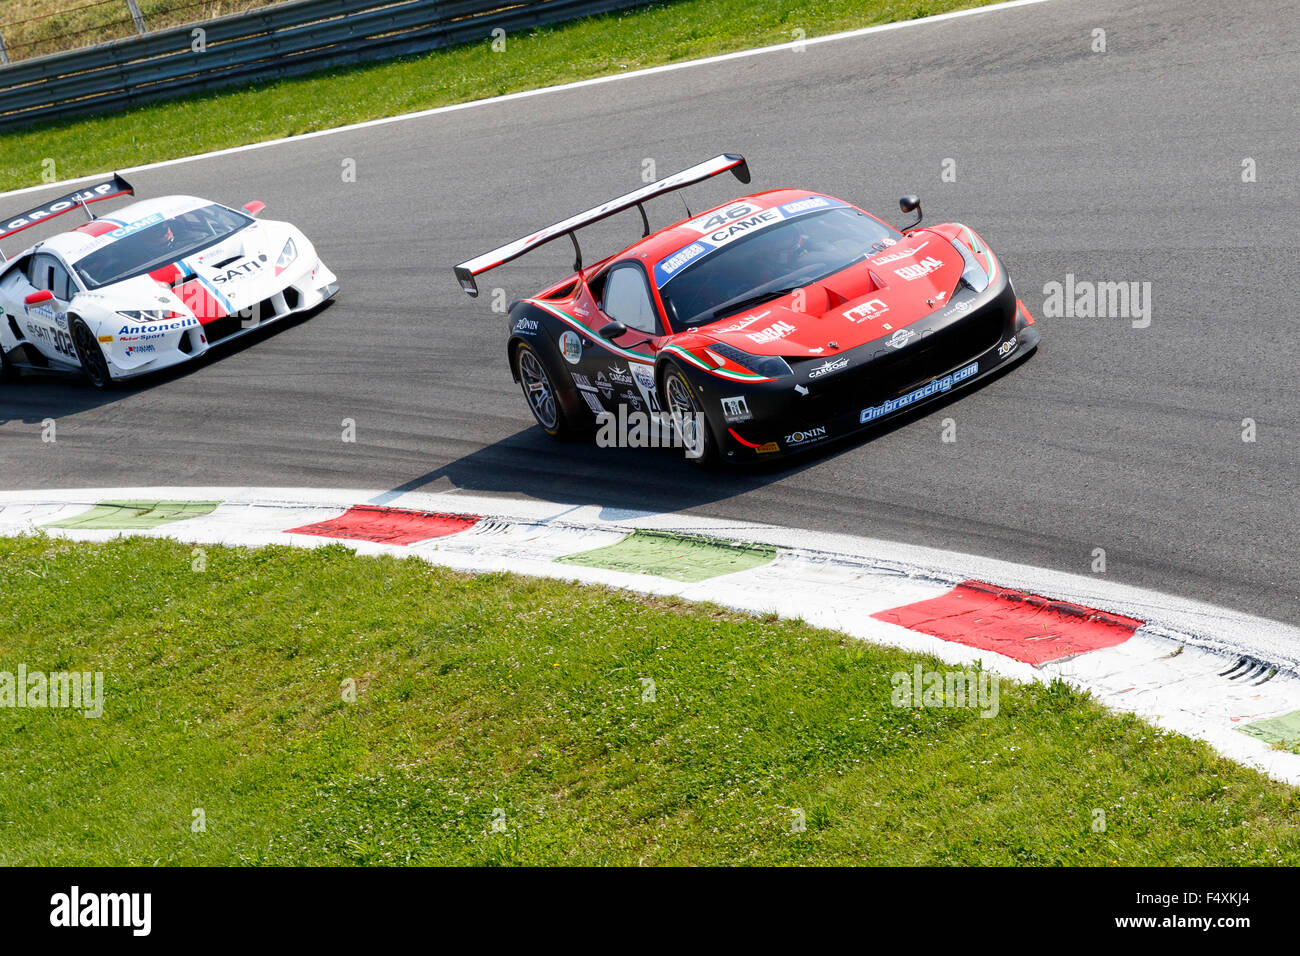 Circuit Monza Italia : Monza italy may ferrari italia of ombra srl team